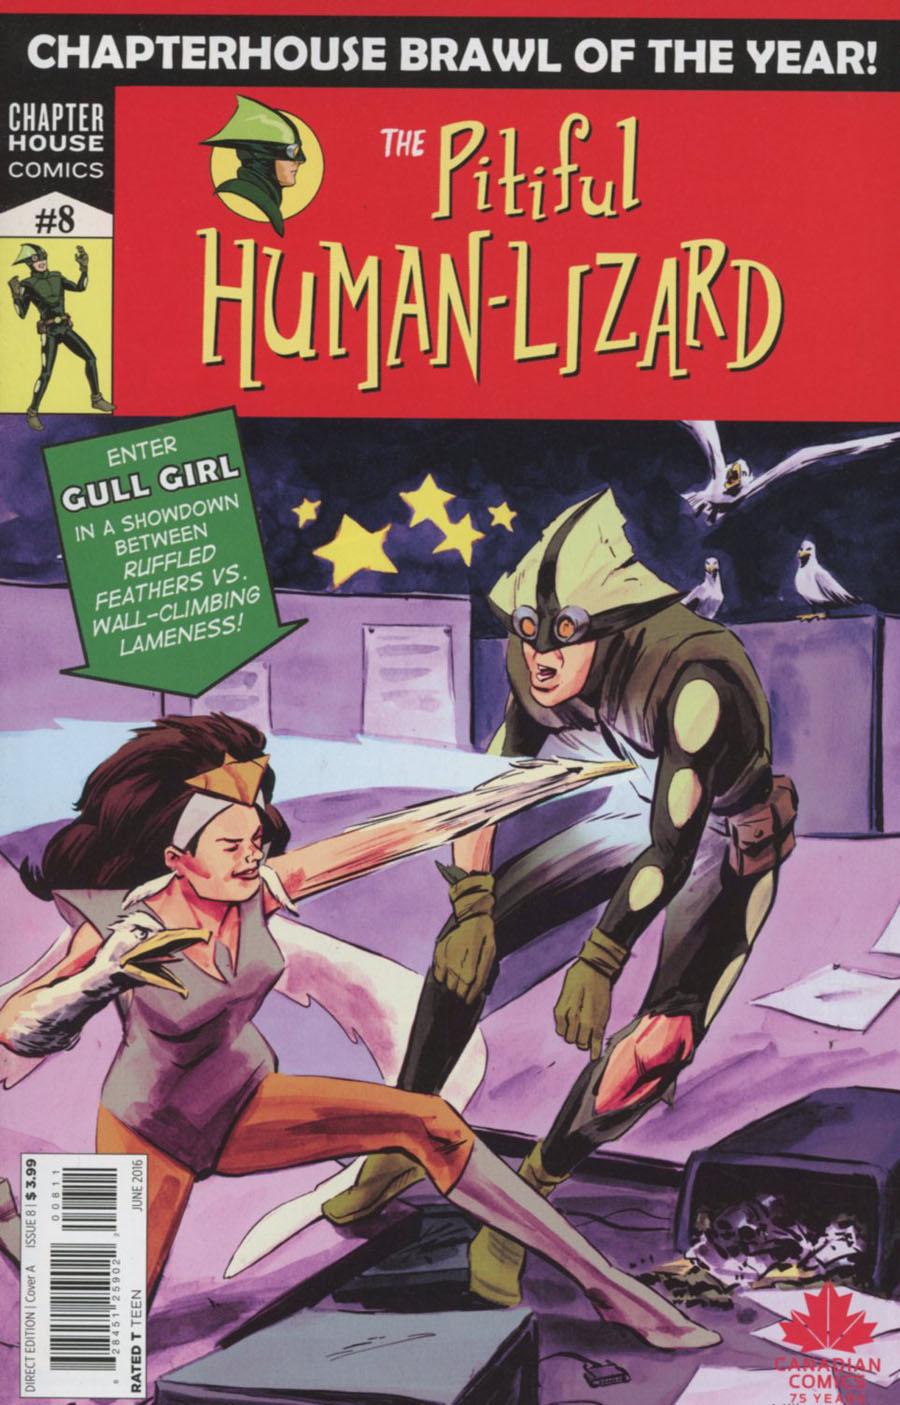 Pitiful Human-Lizard #8 Cover A Regular Jason Loo Cover